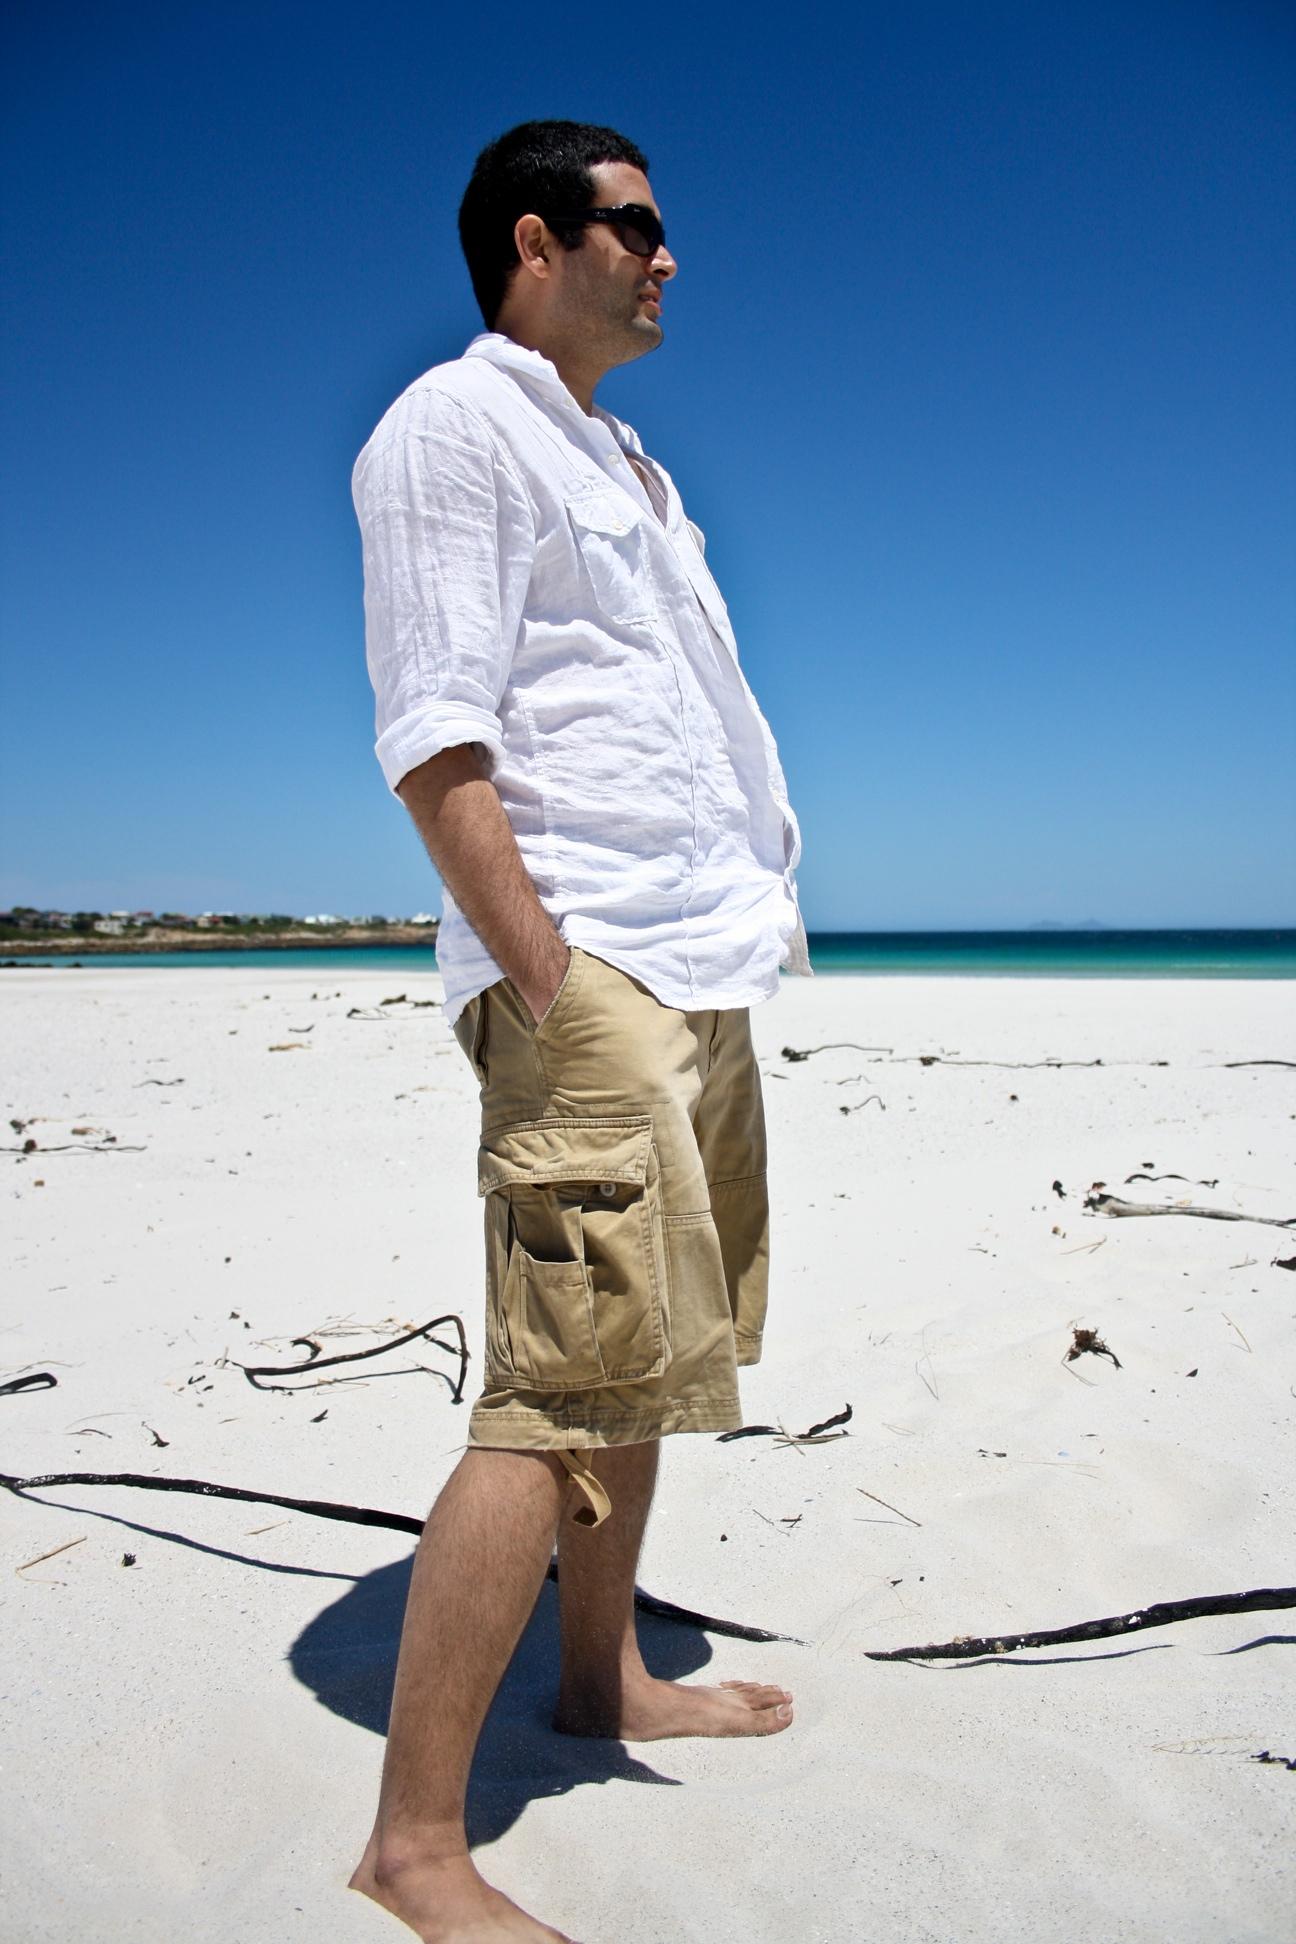 Danish Aslam At Pringle Bay Beach South Africa